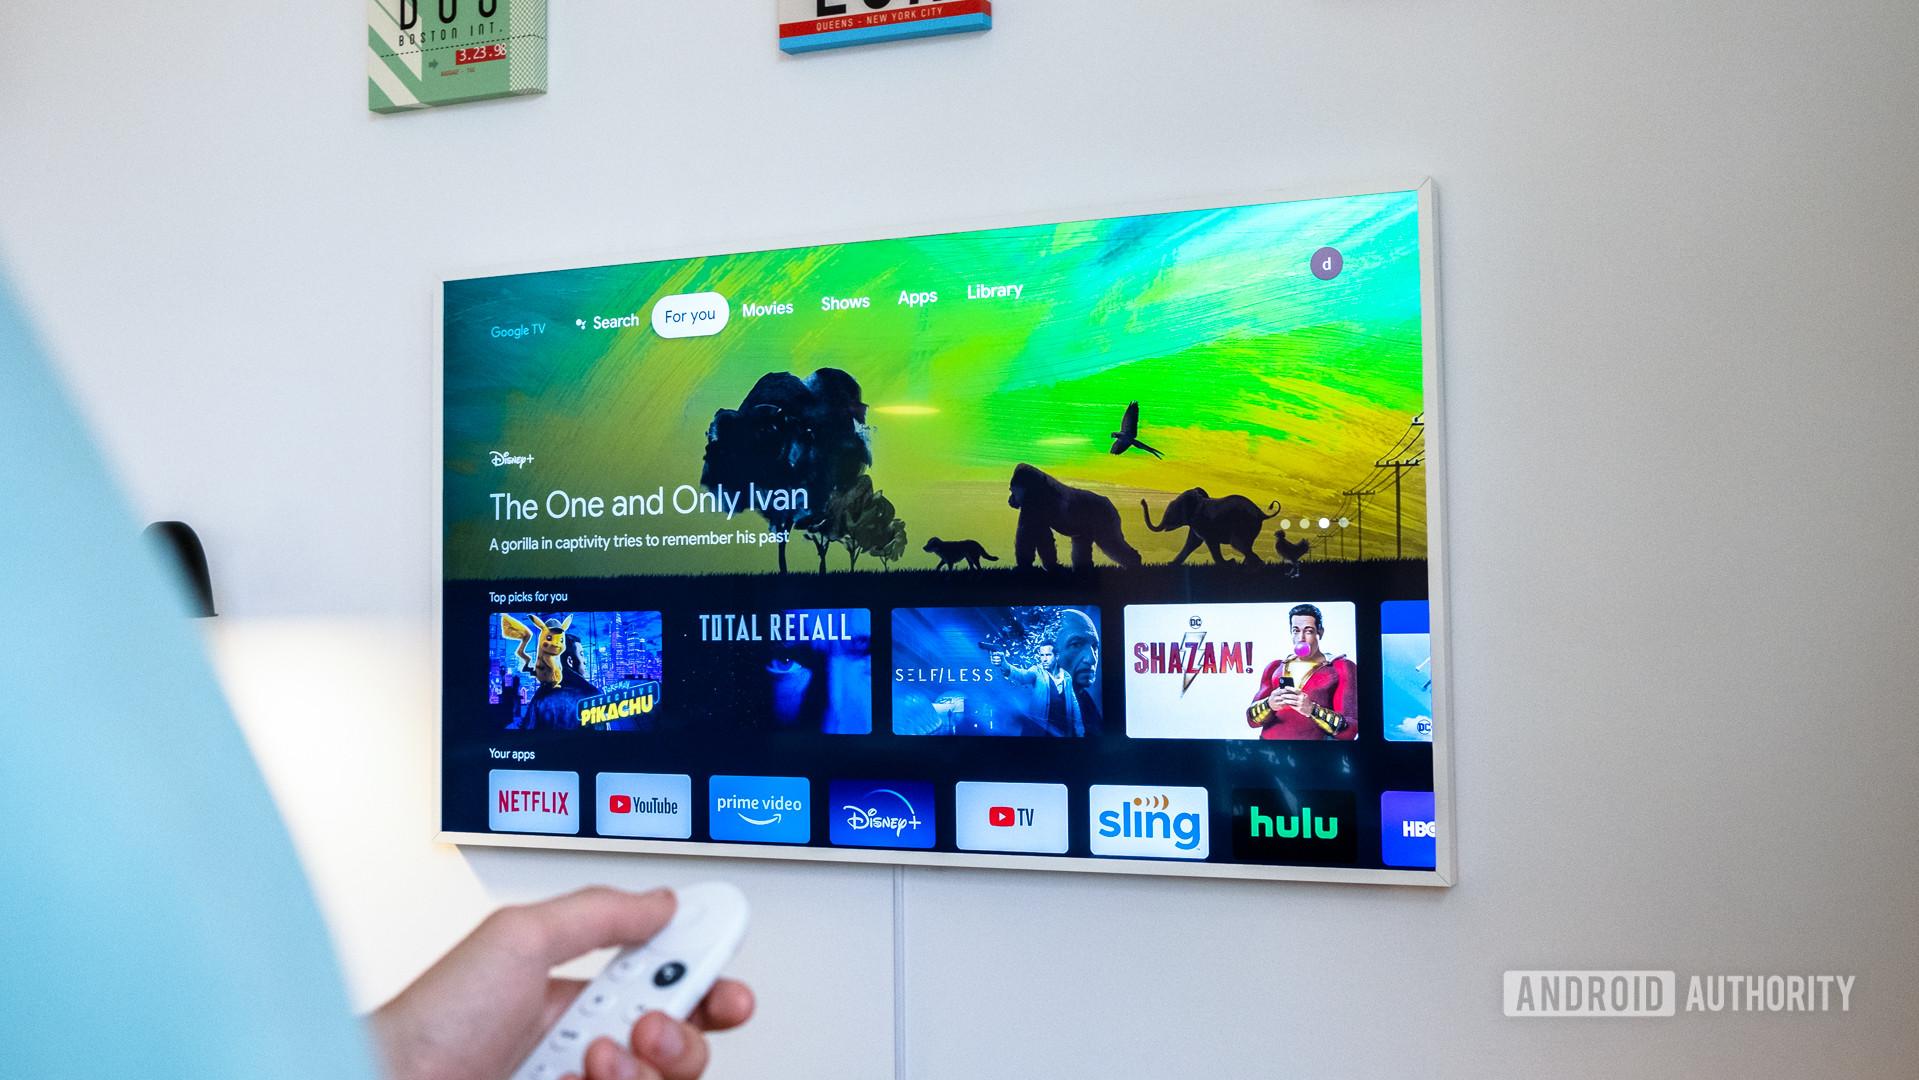 Google Chromecast with Google TV for you tab